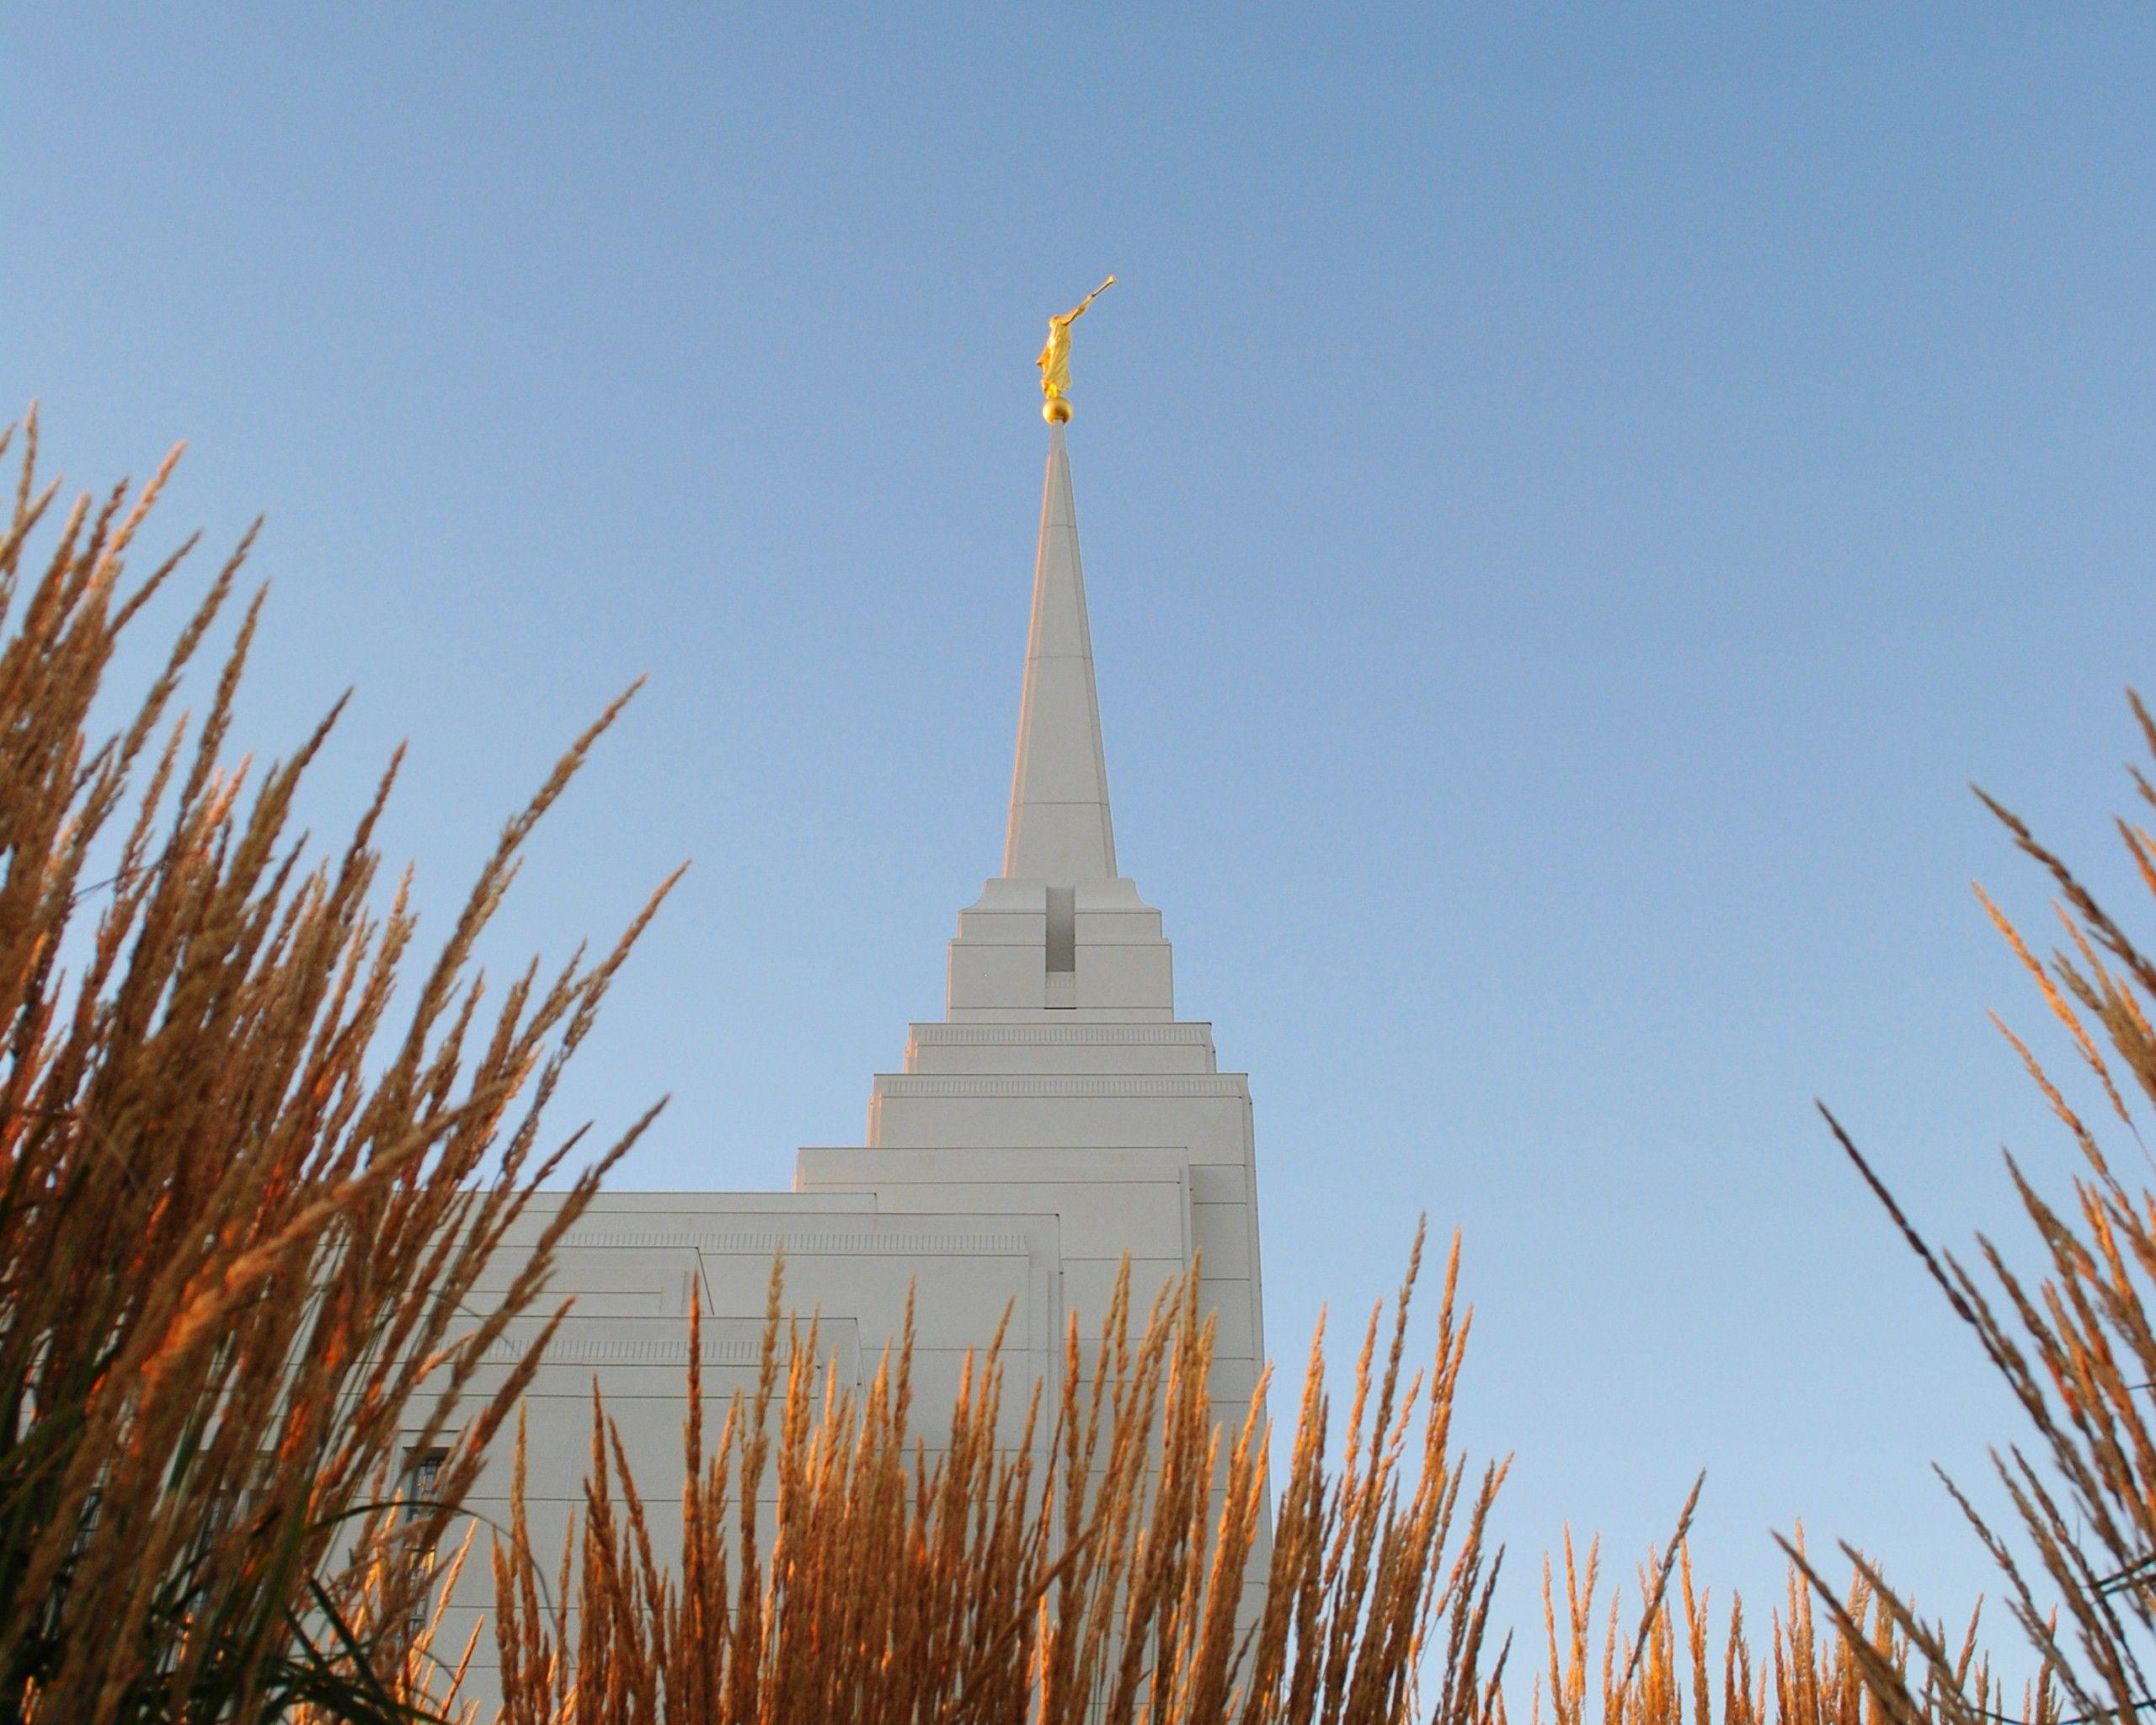 The Rexburg Idaho Temple spire, including scenery.